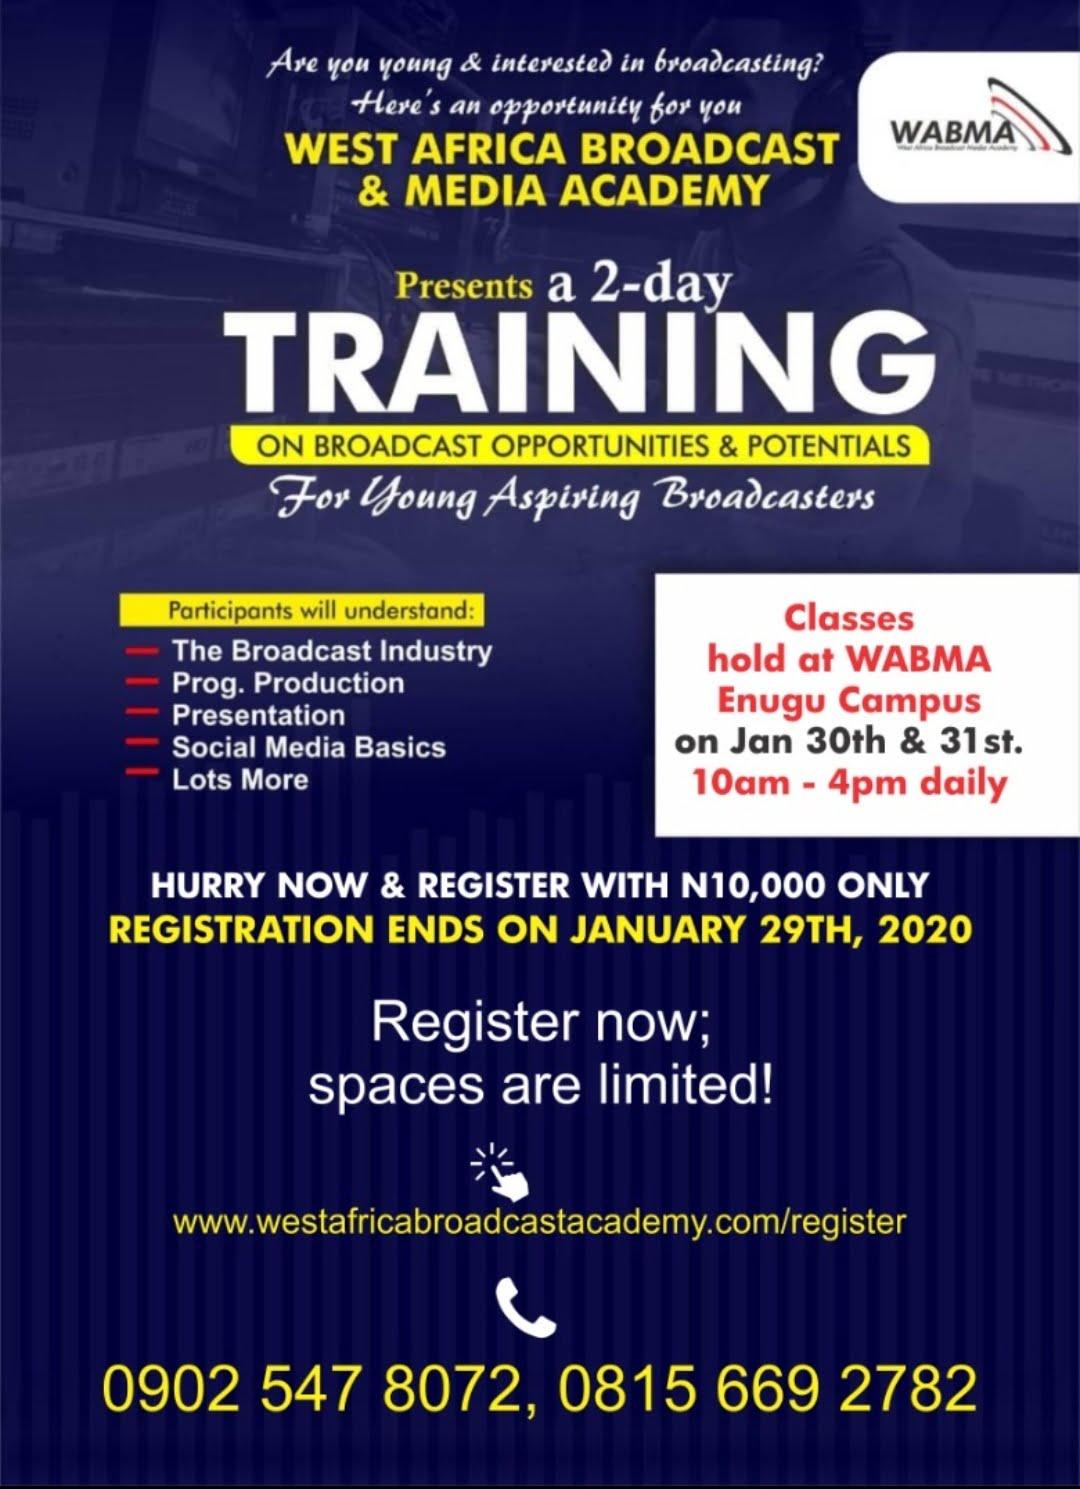 West Africa Broadcast Academy